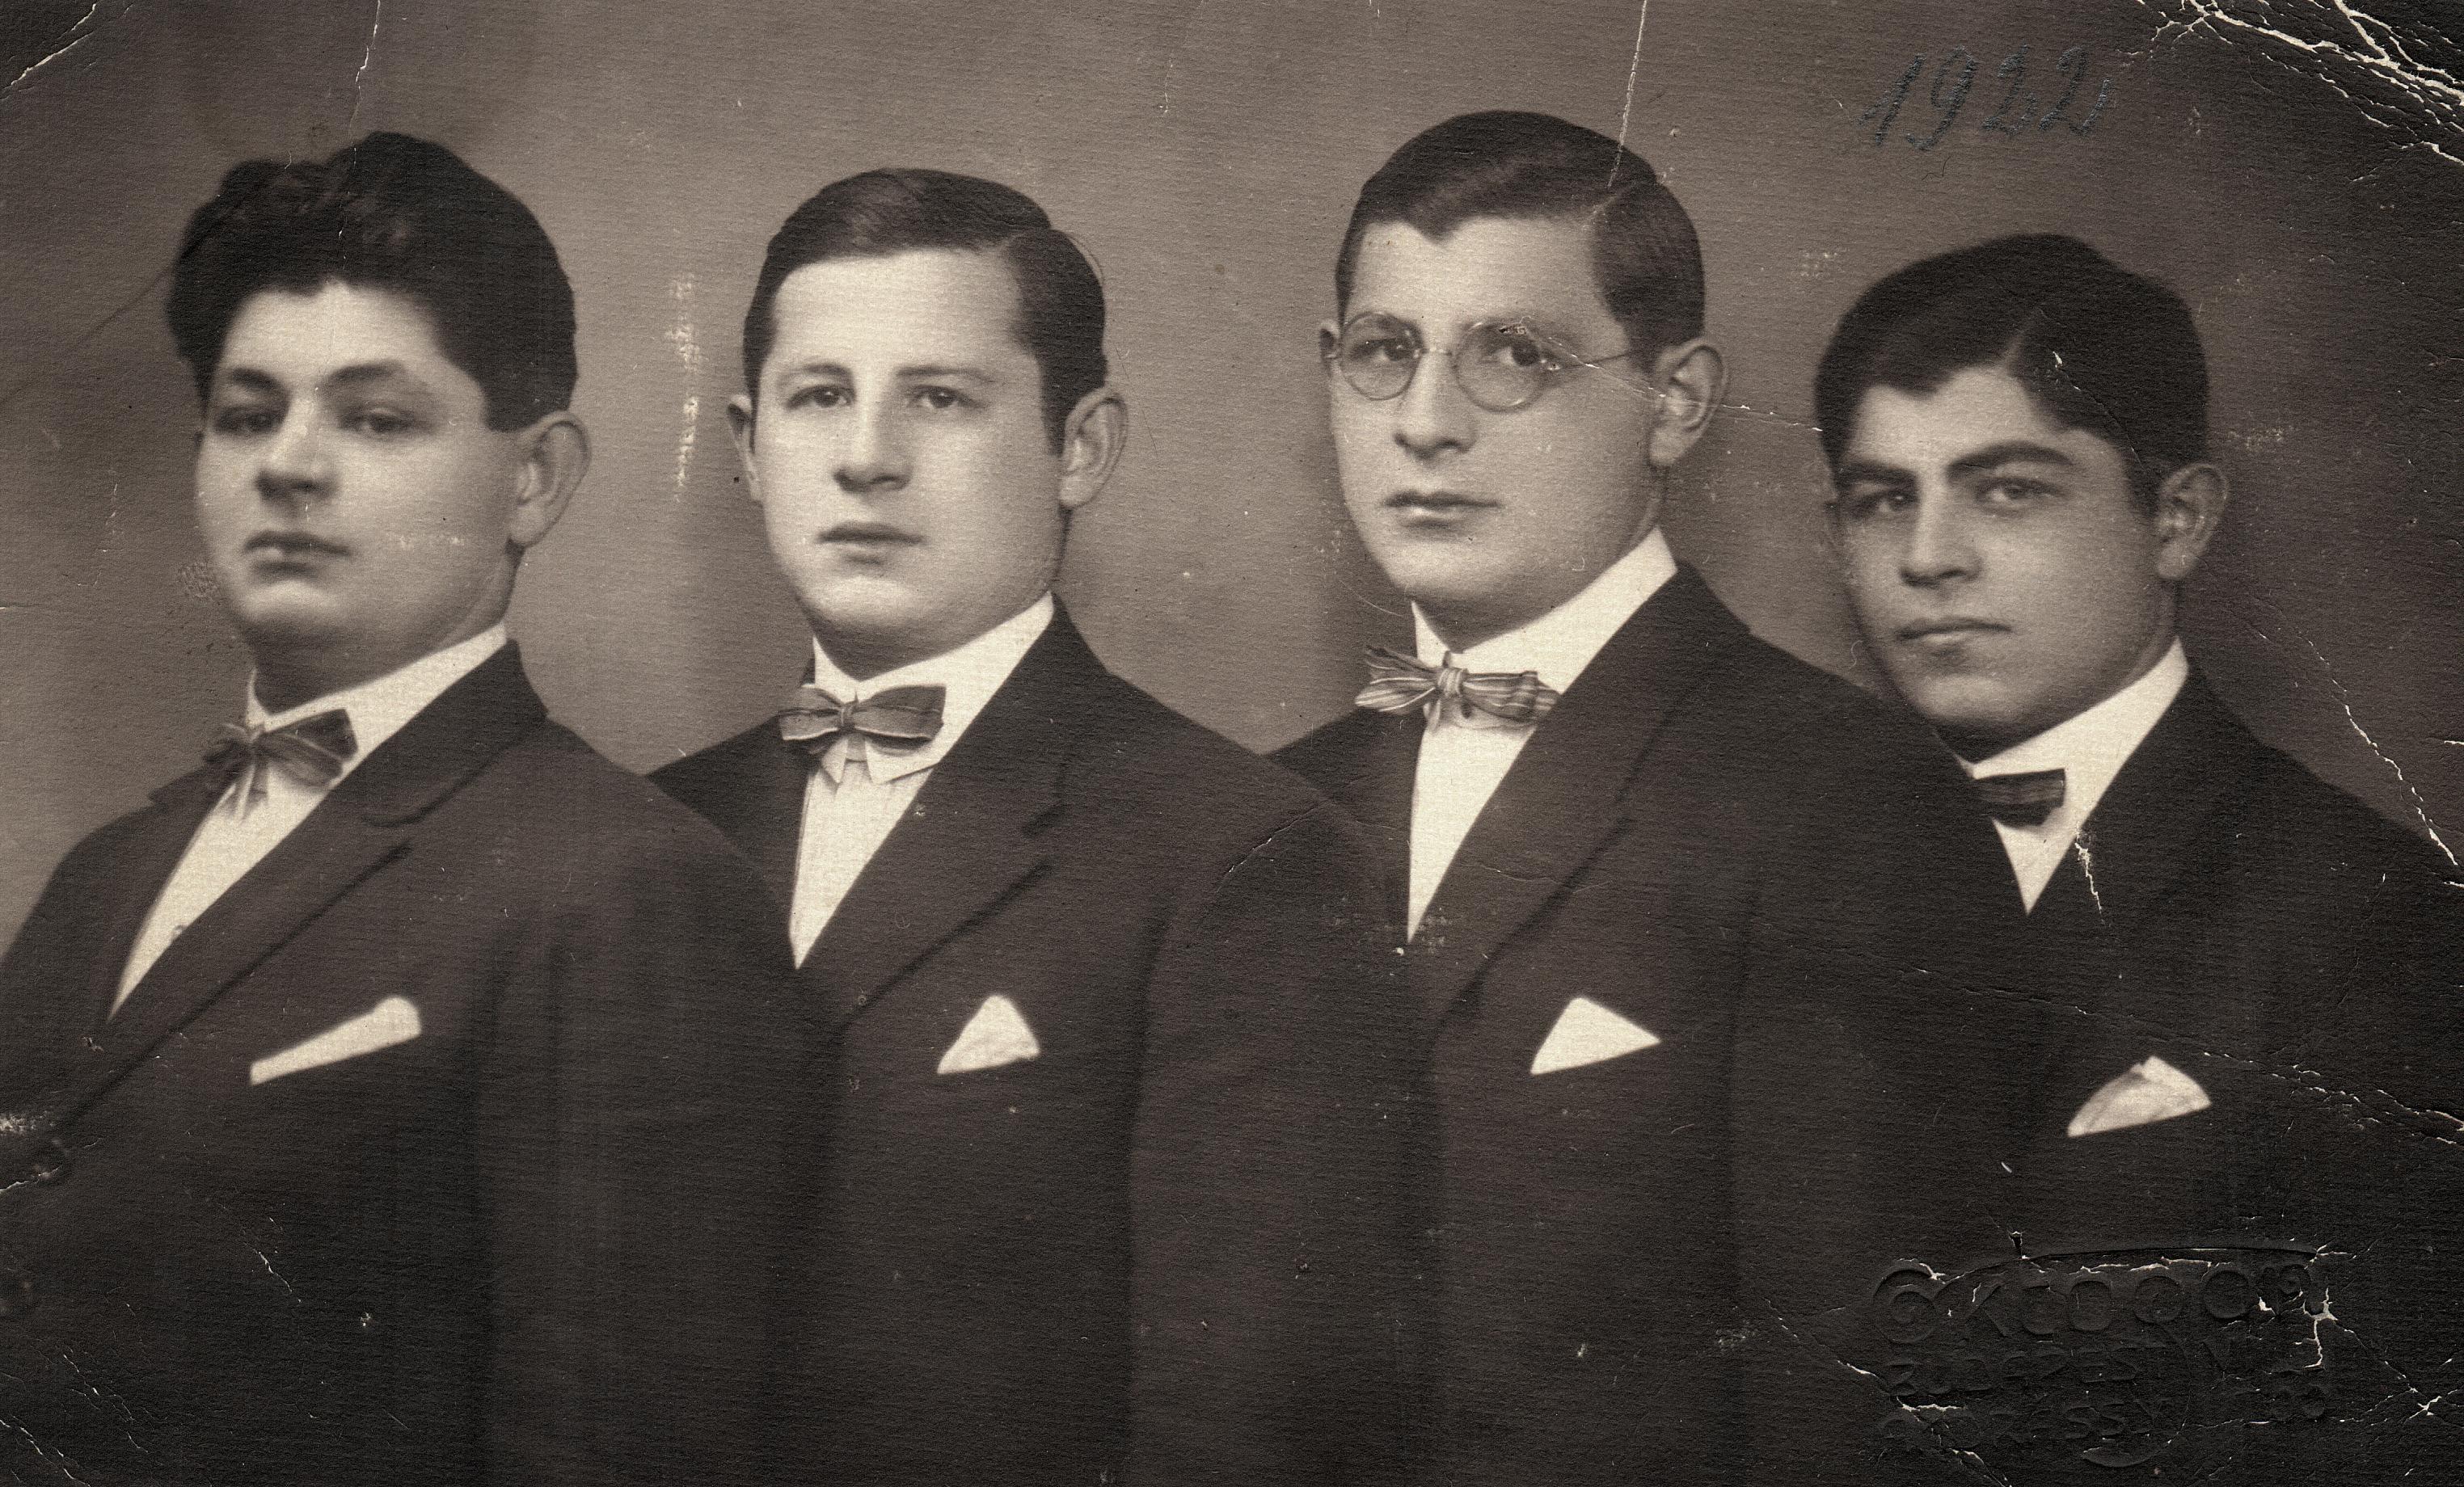 The Nussbaum brothers: Laszlo, Jeno, Jozsef, Sandor